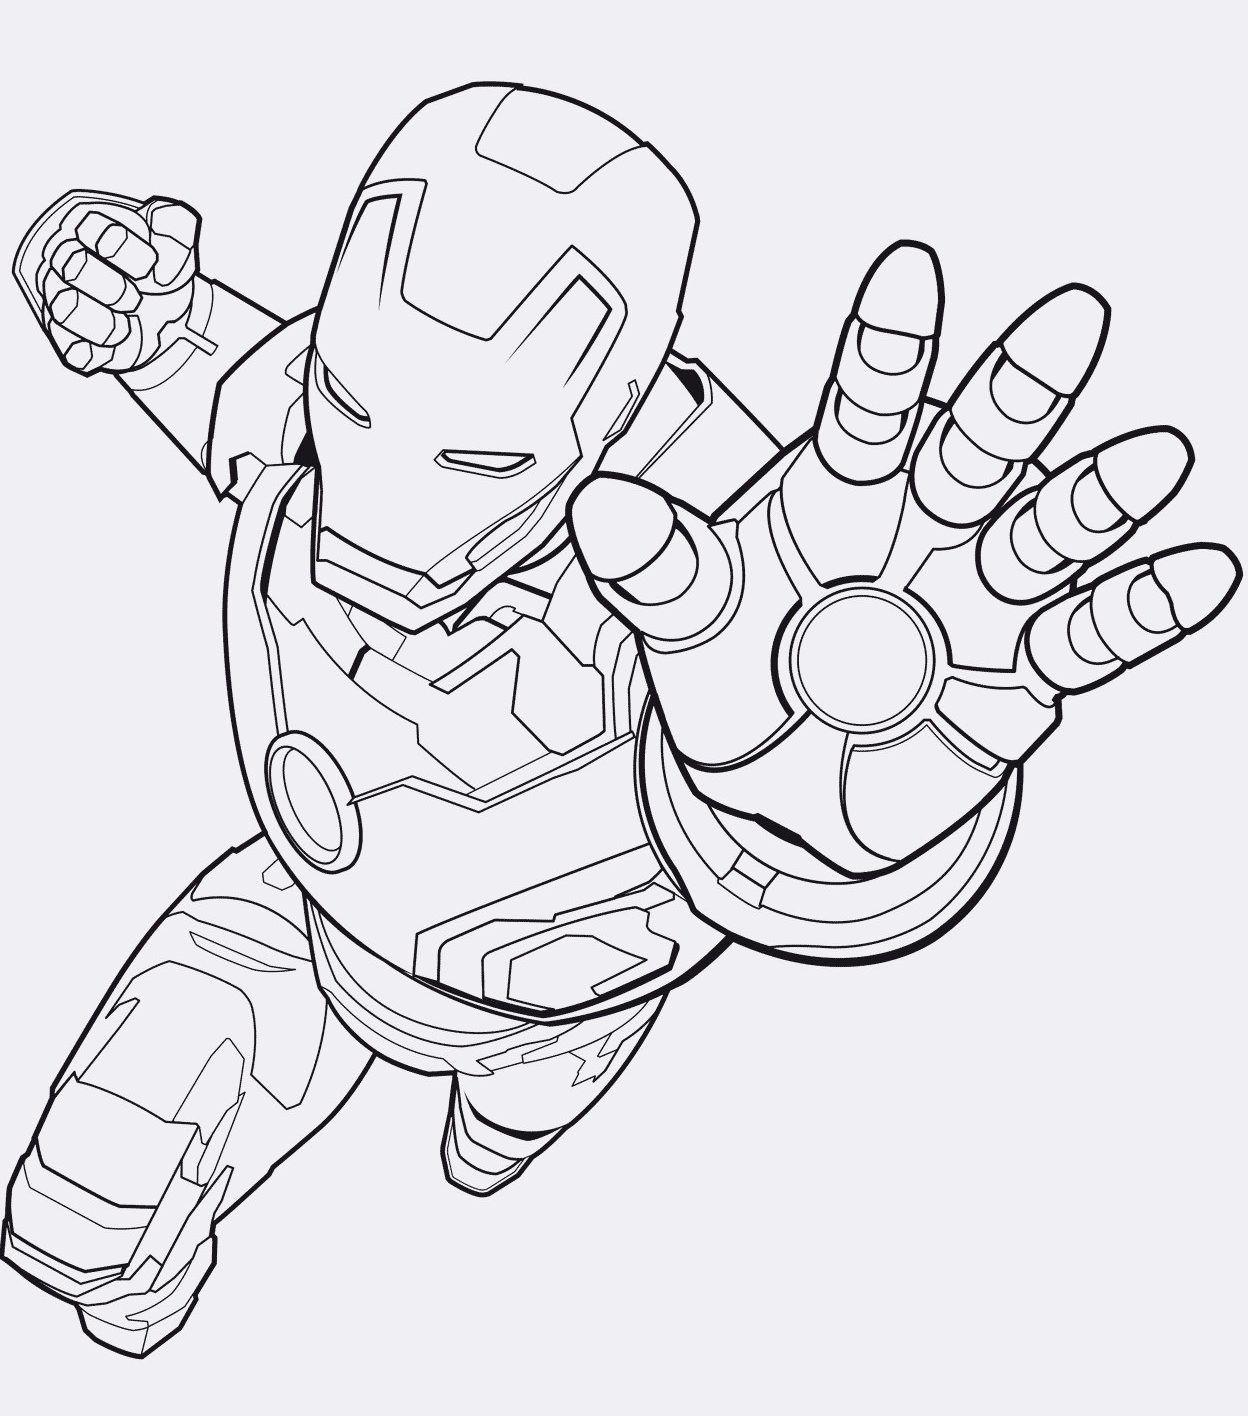 Ausmalbilder Avengers Iron Man E1541616601319 Ironman Avengers Printables Free Superhelden Malvorlagen Ausmalbilder Marvel Zeichnungen